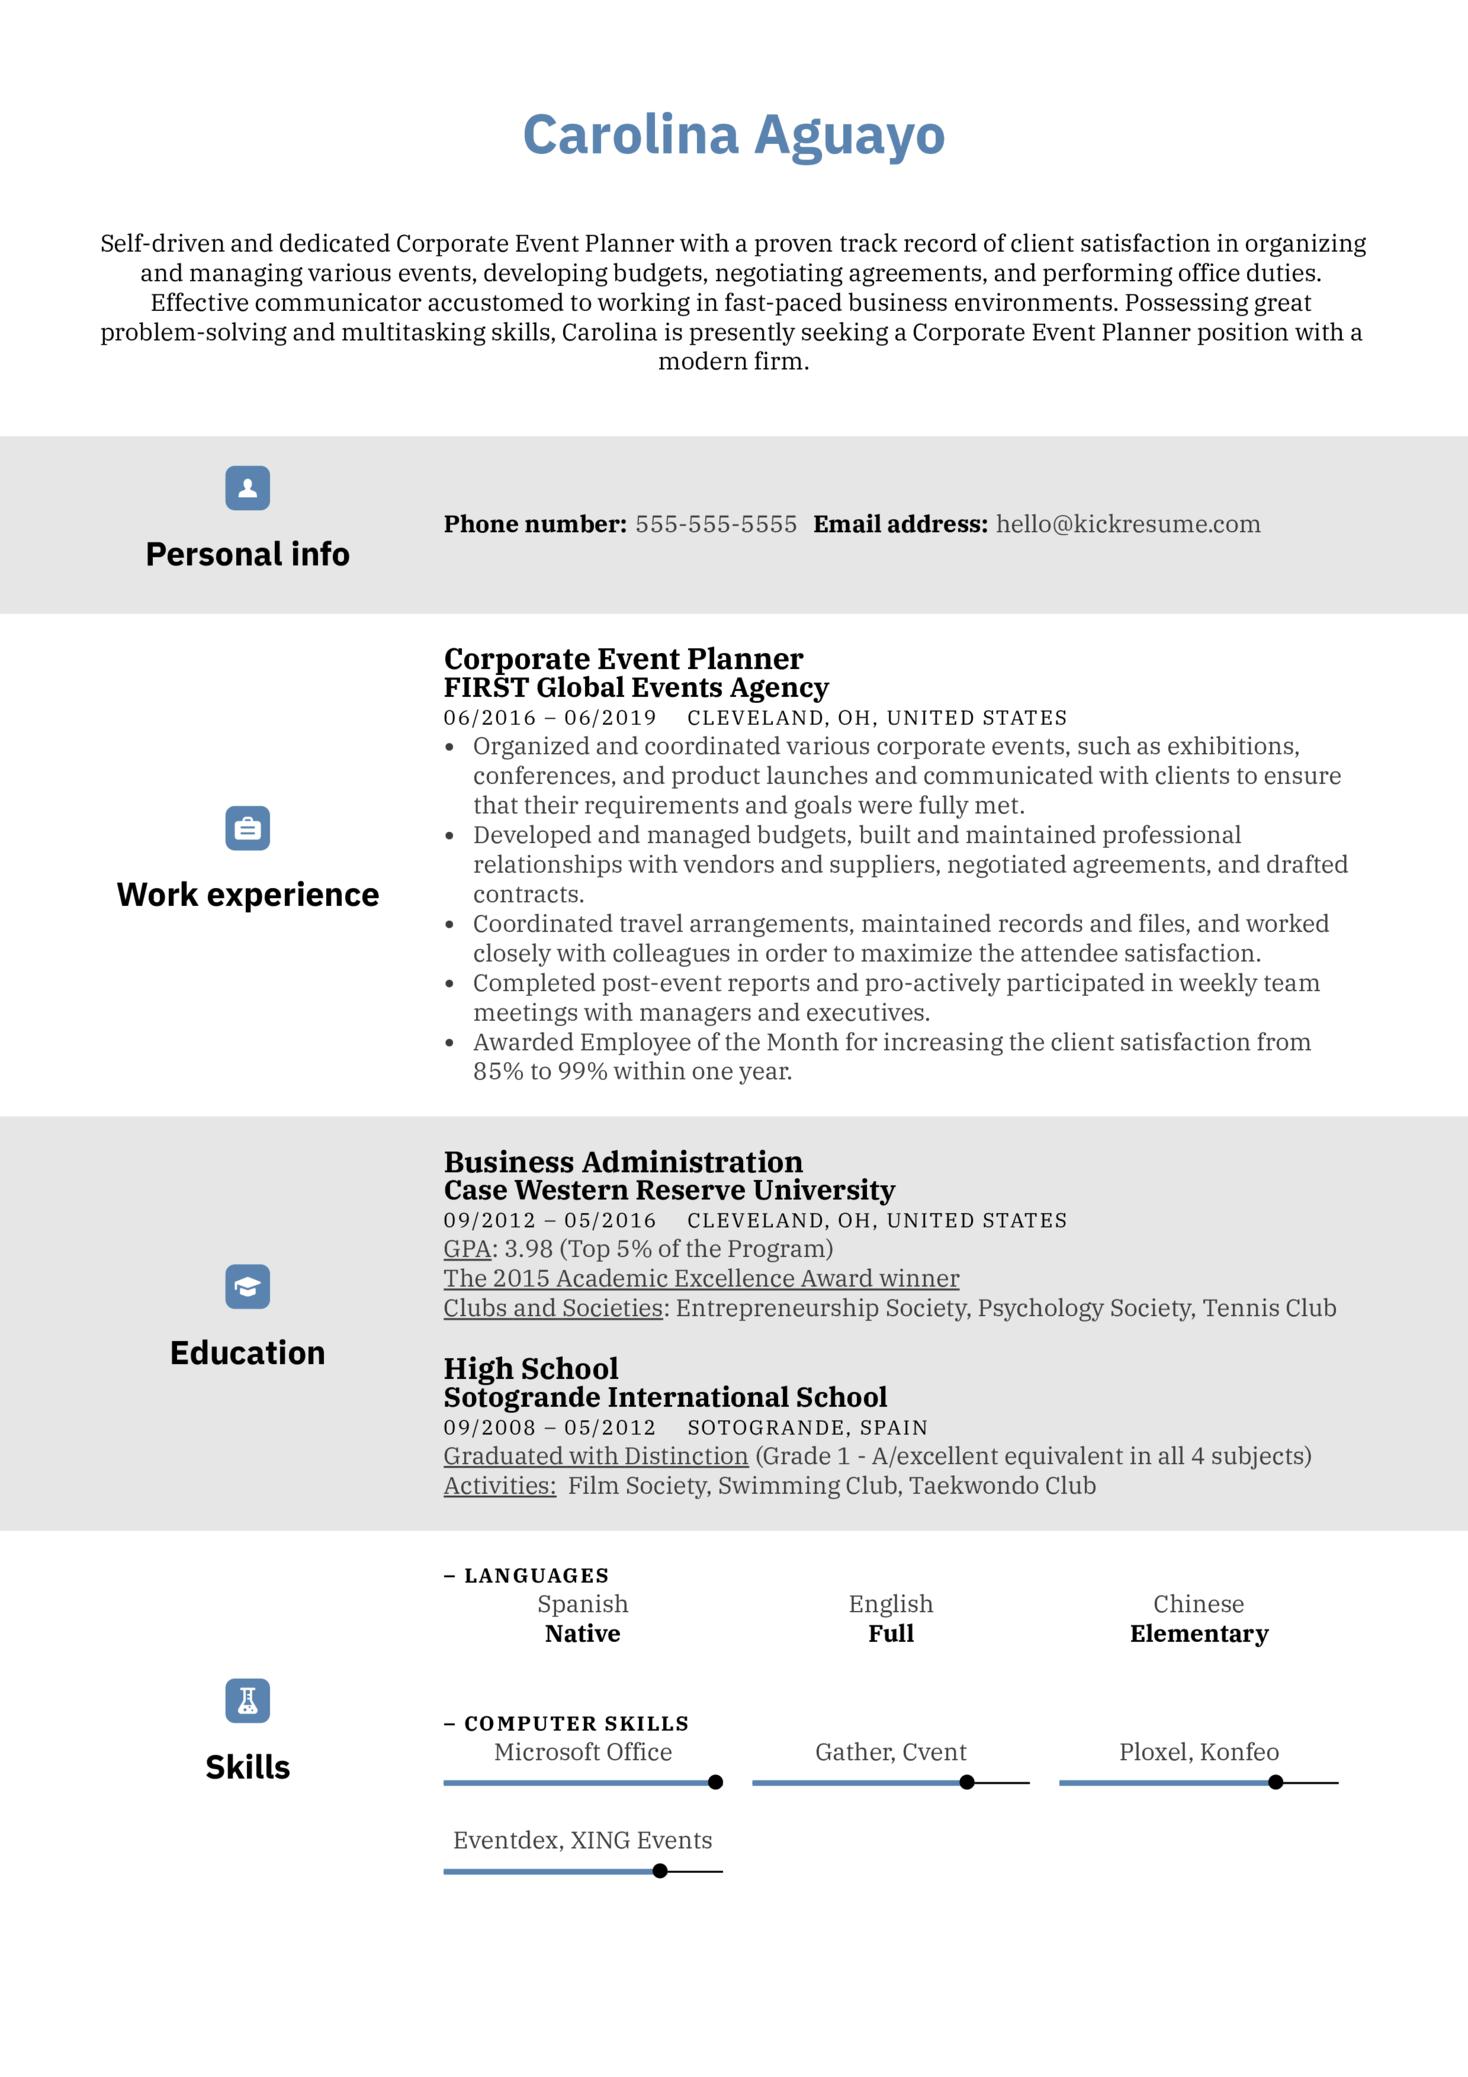 Corporate Event Planner Resume Sample (Part 1)